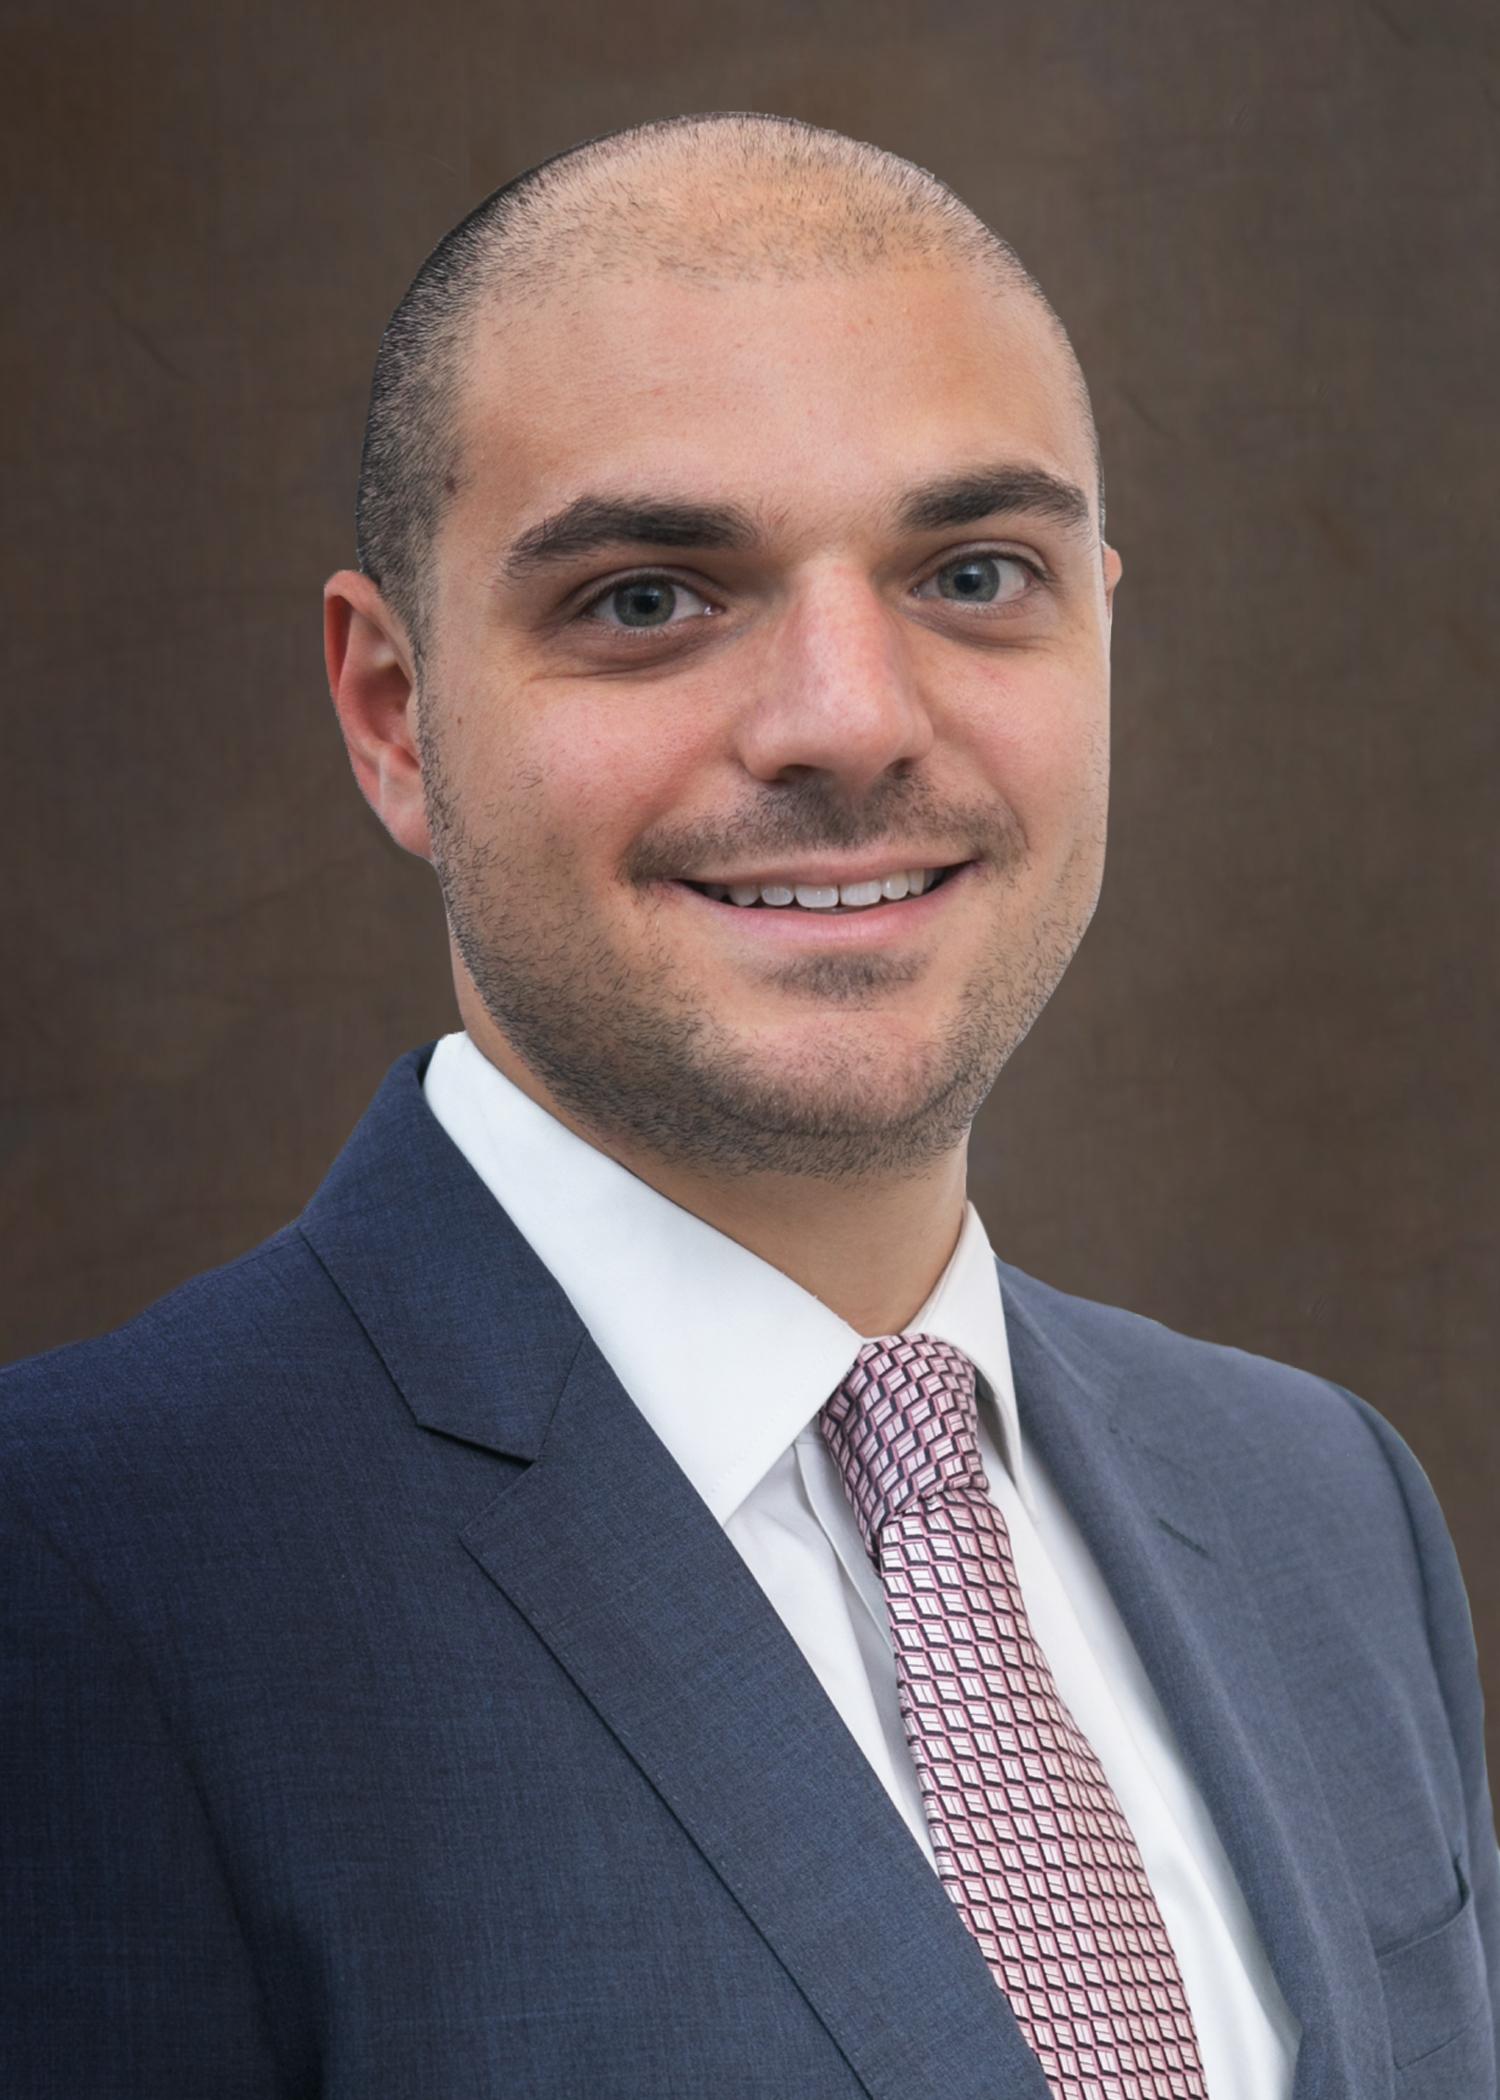 Matthew Chodosh